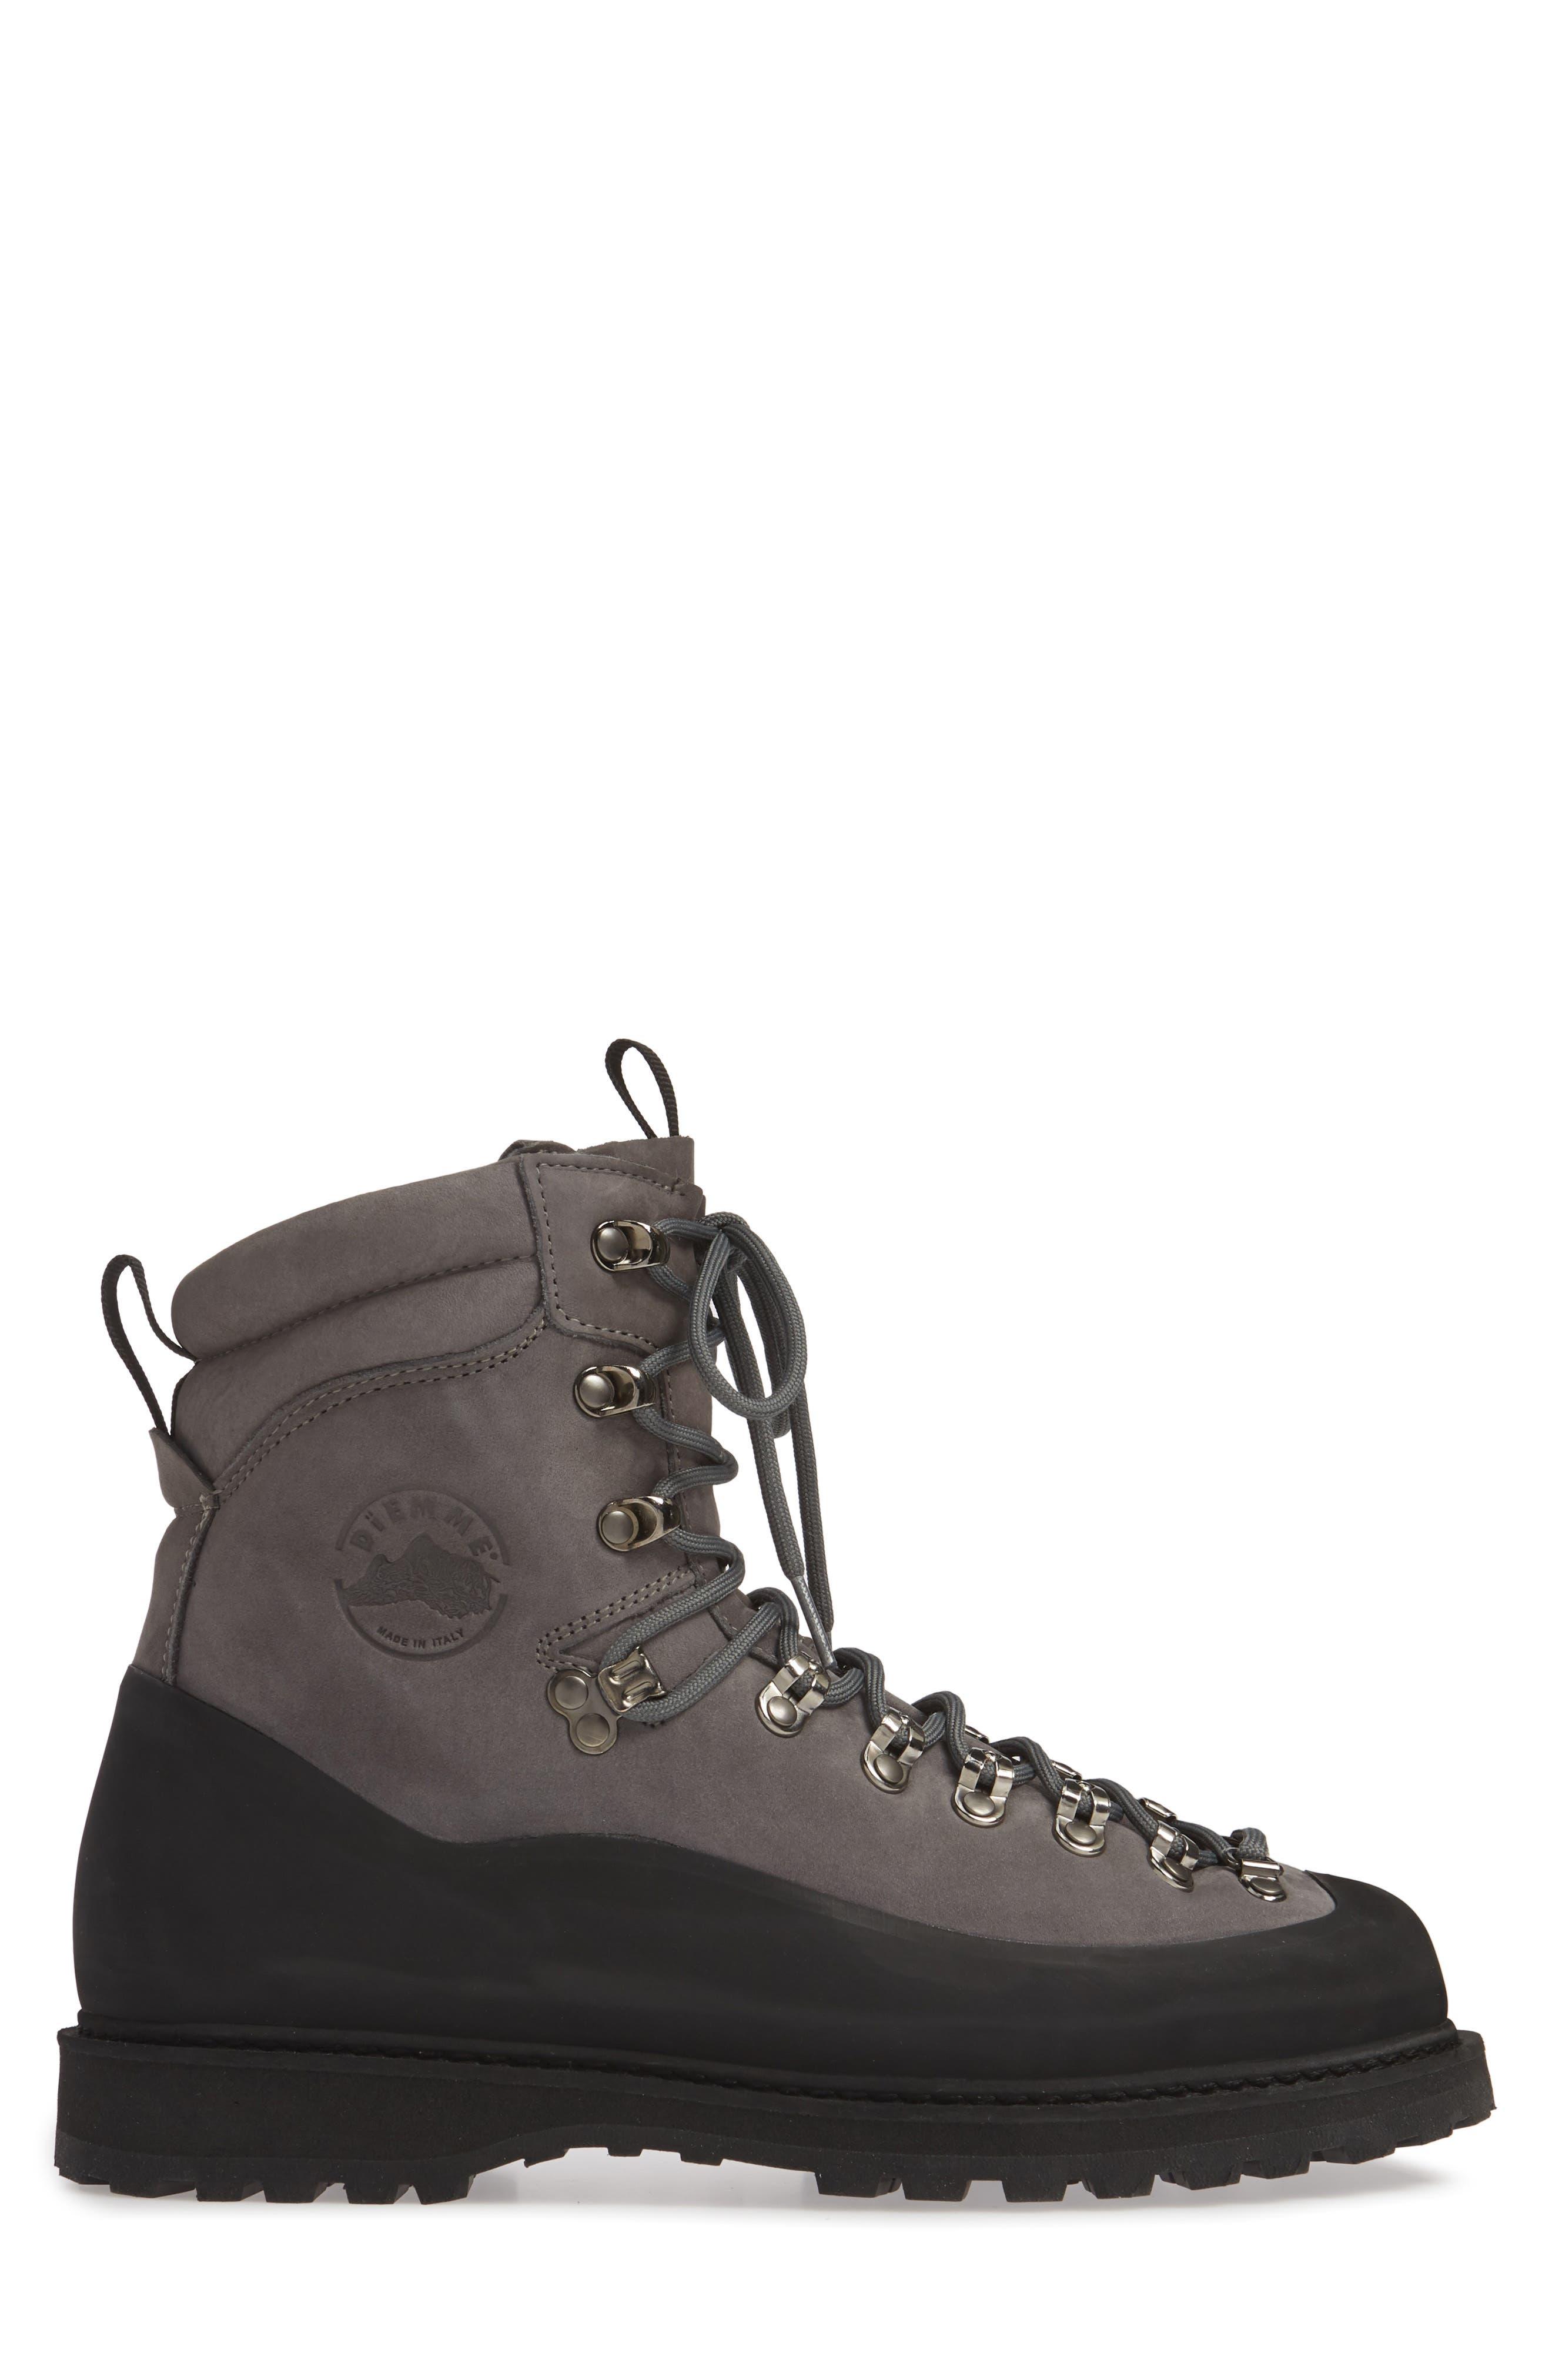 DIEMME Everest Nubuck Boot, Main, color, DARK GREY